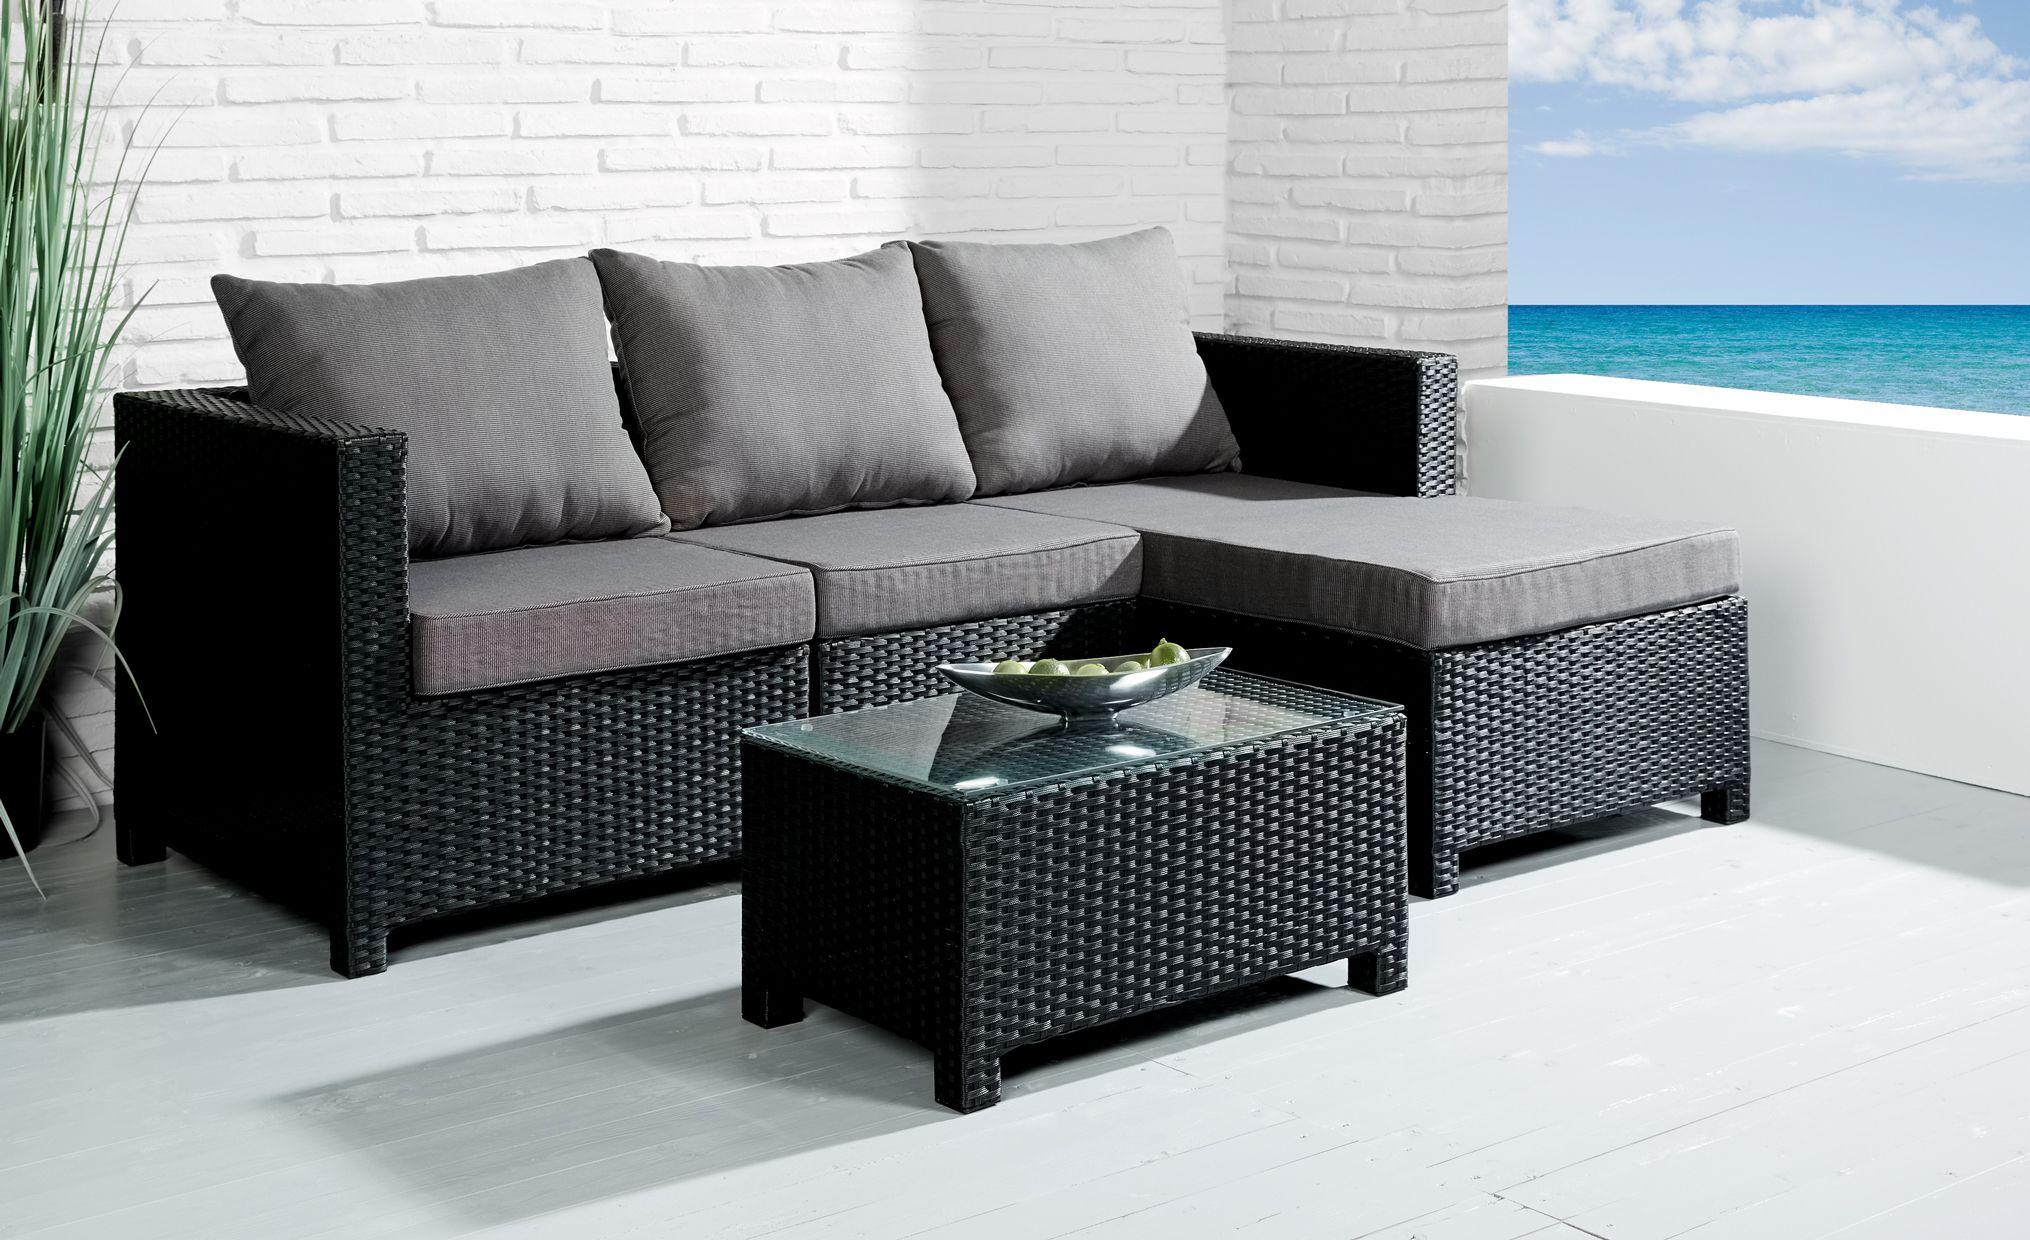 Sitzgruppe Comfortlounge 4 tlg. schwarz Gartengarnitur Lounge ...